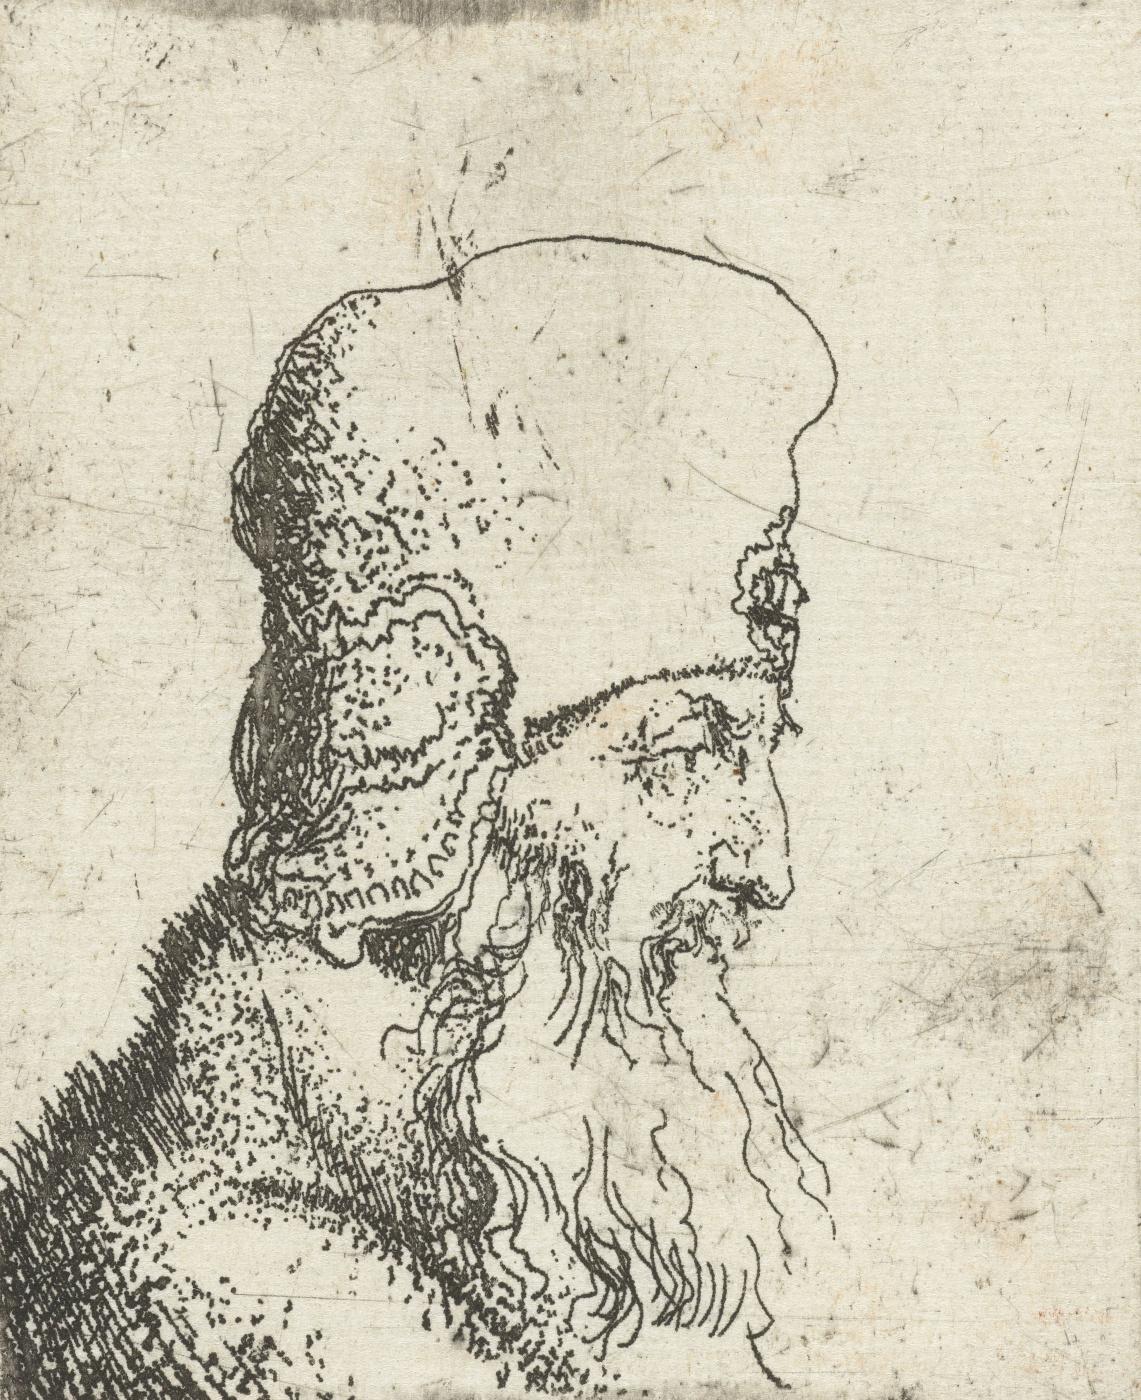 Jan Lievens. A bearded man in a high hat